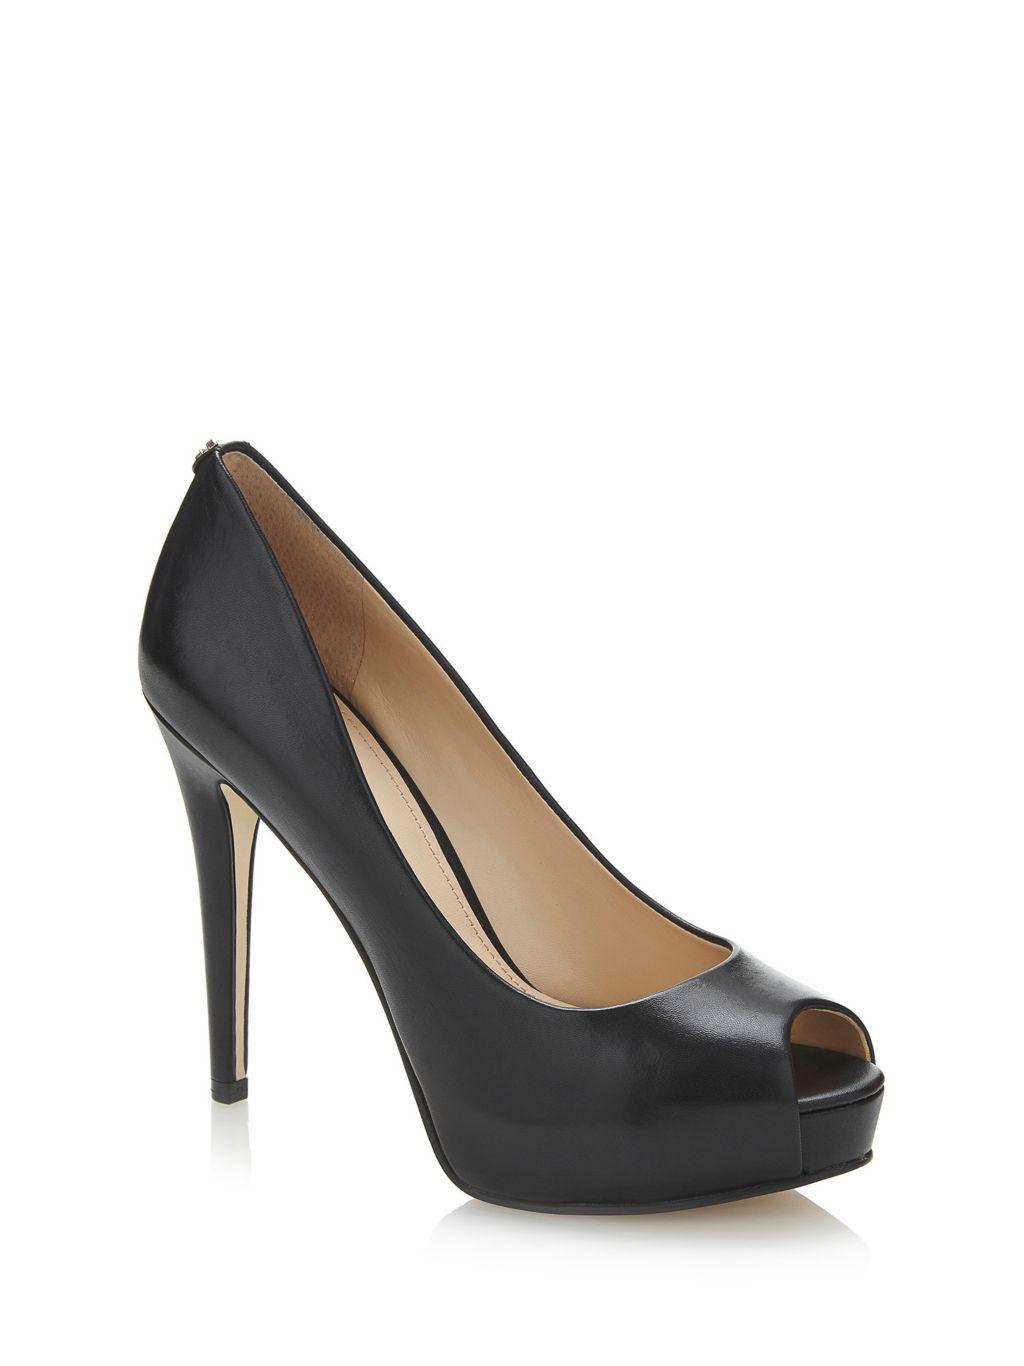 Guess Zapato Con Punta Abierta Haddie Piel